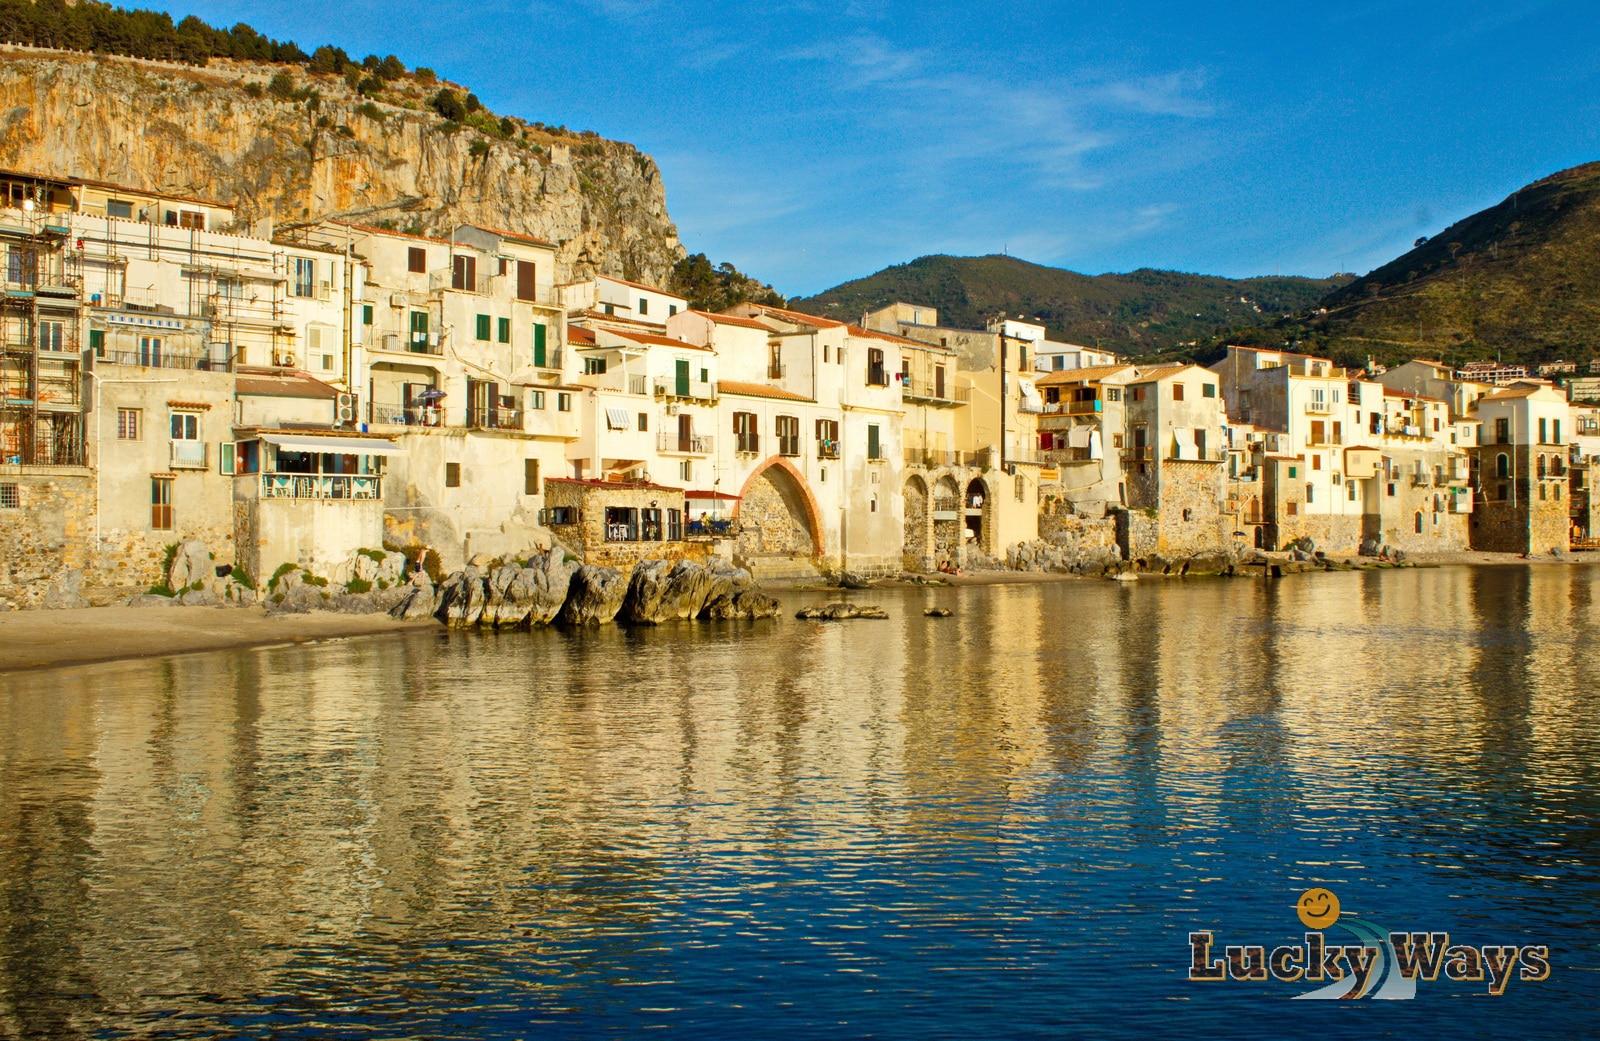 Italien Sizilien, Teil 4 Cefalù - Strandpanorama